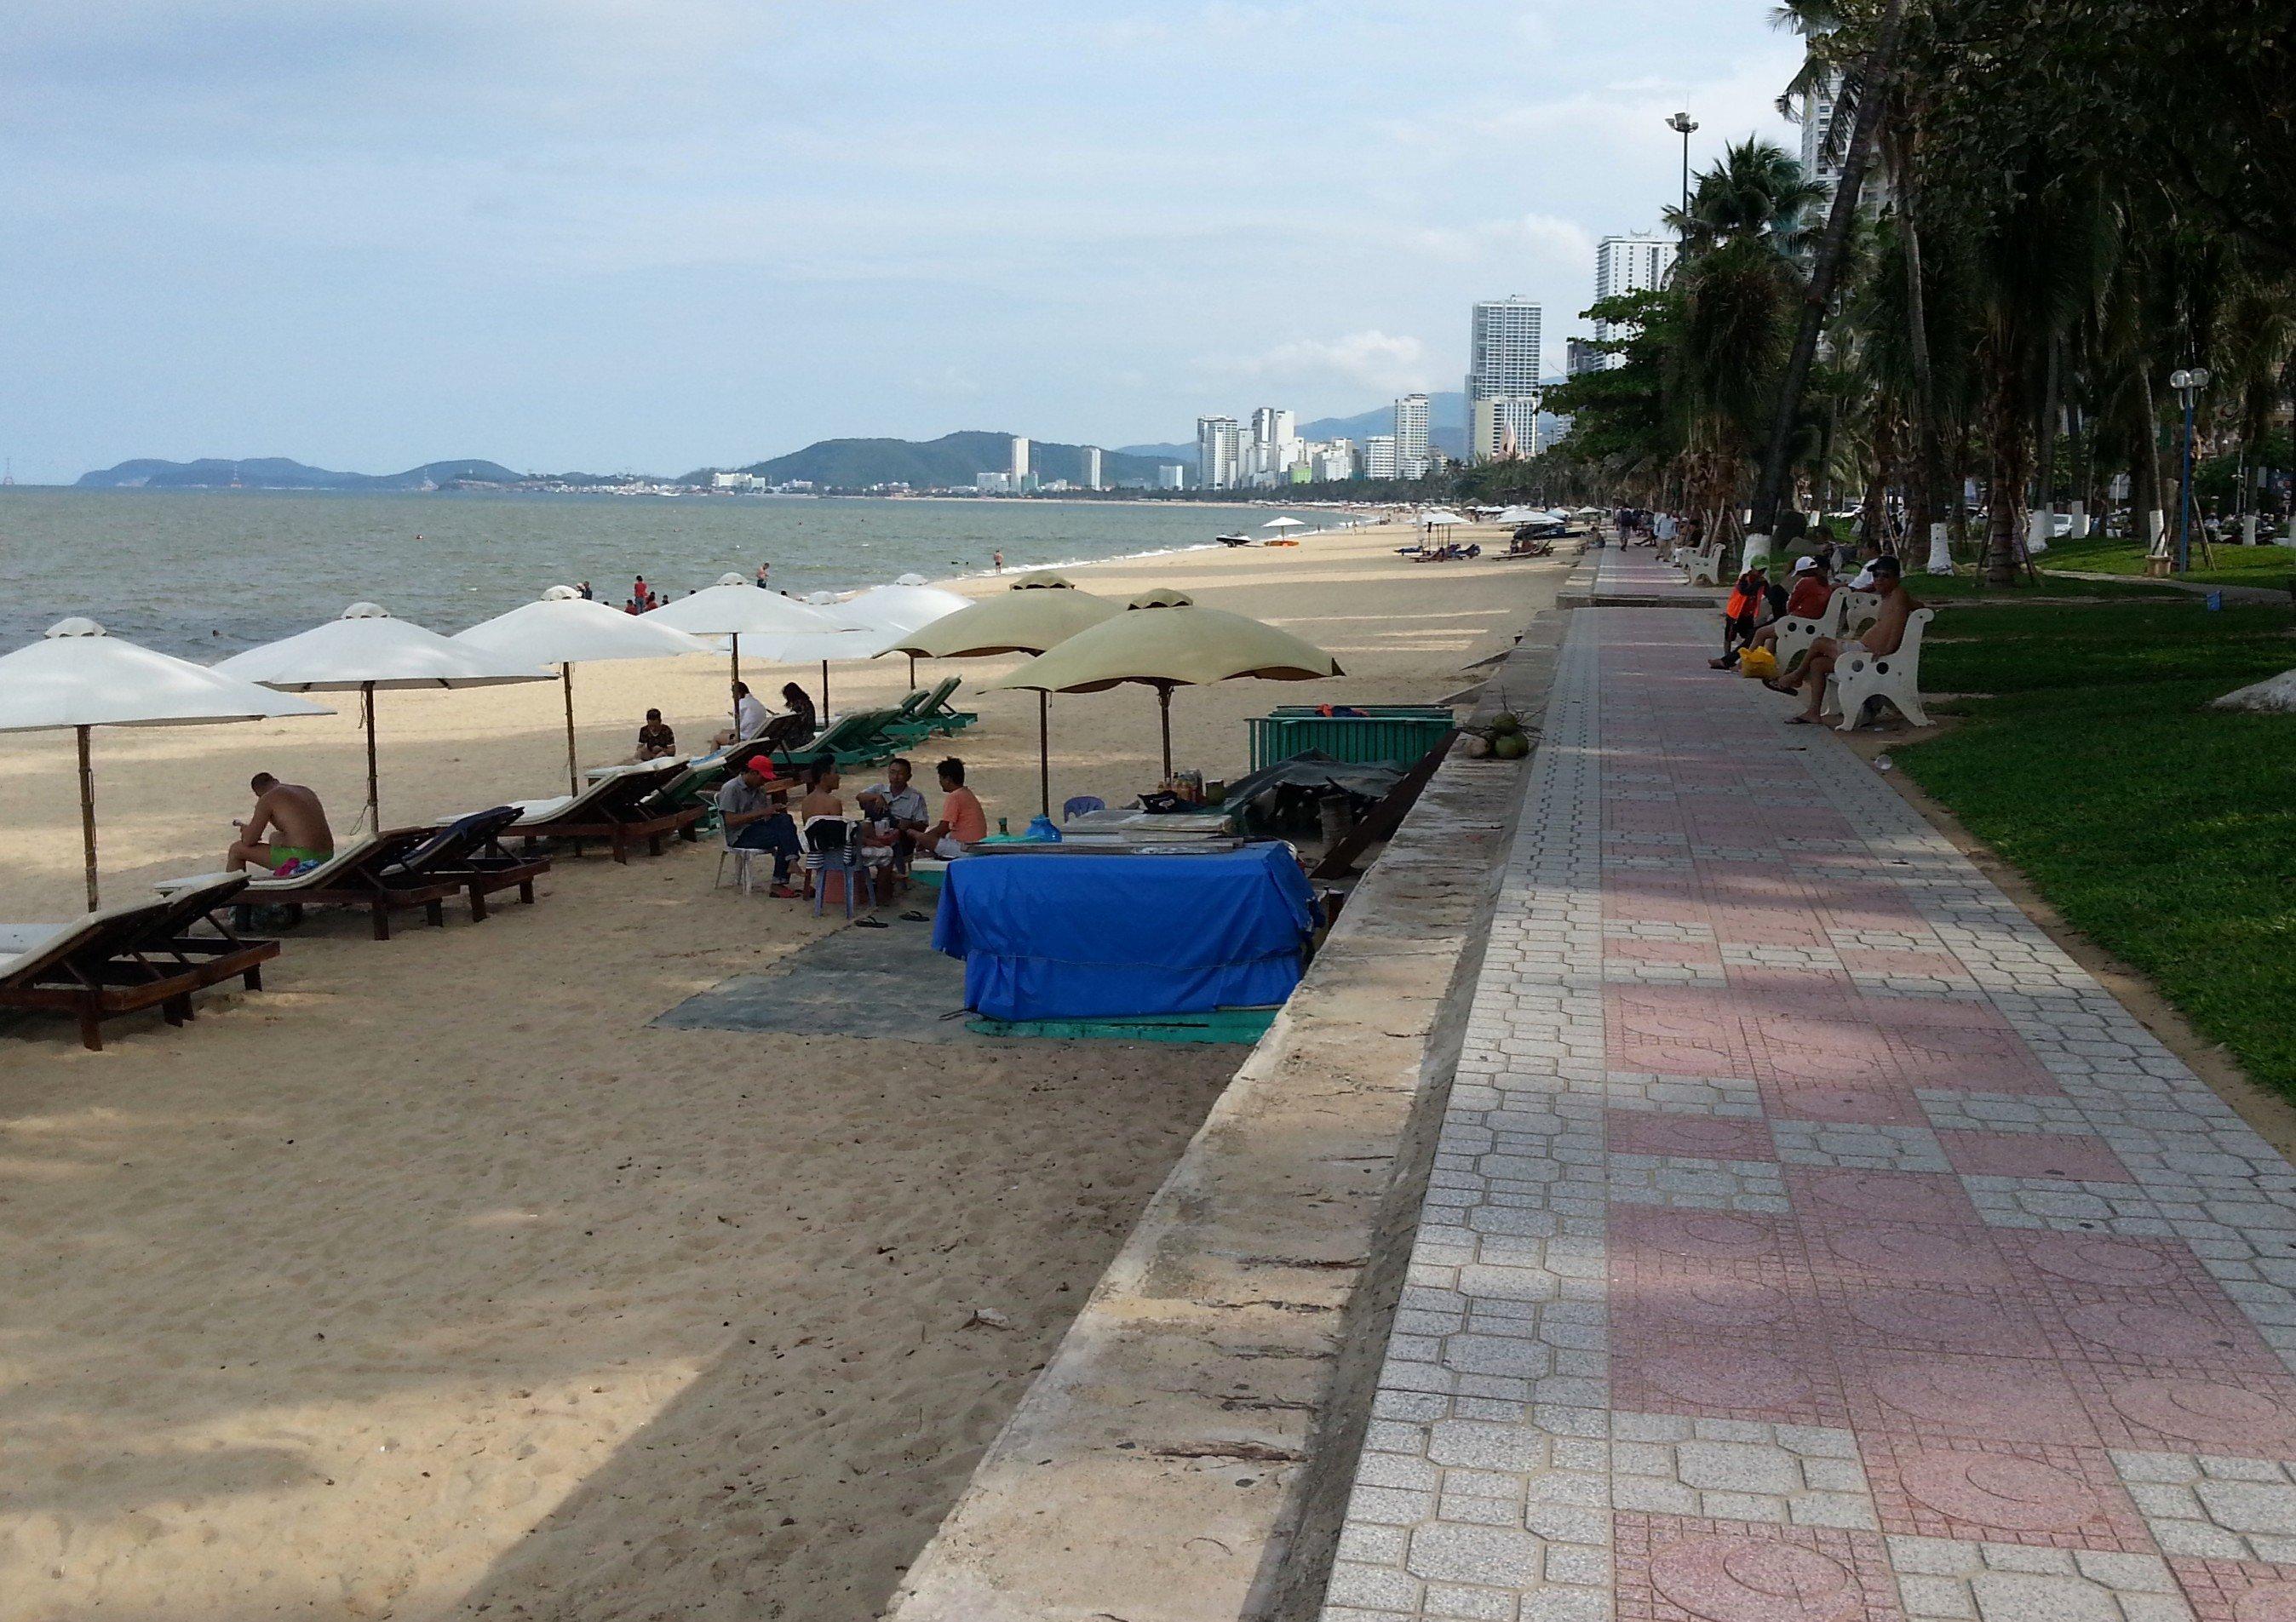 Beach front in Nha Trang